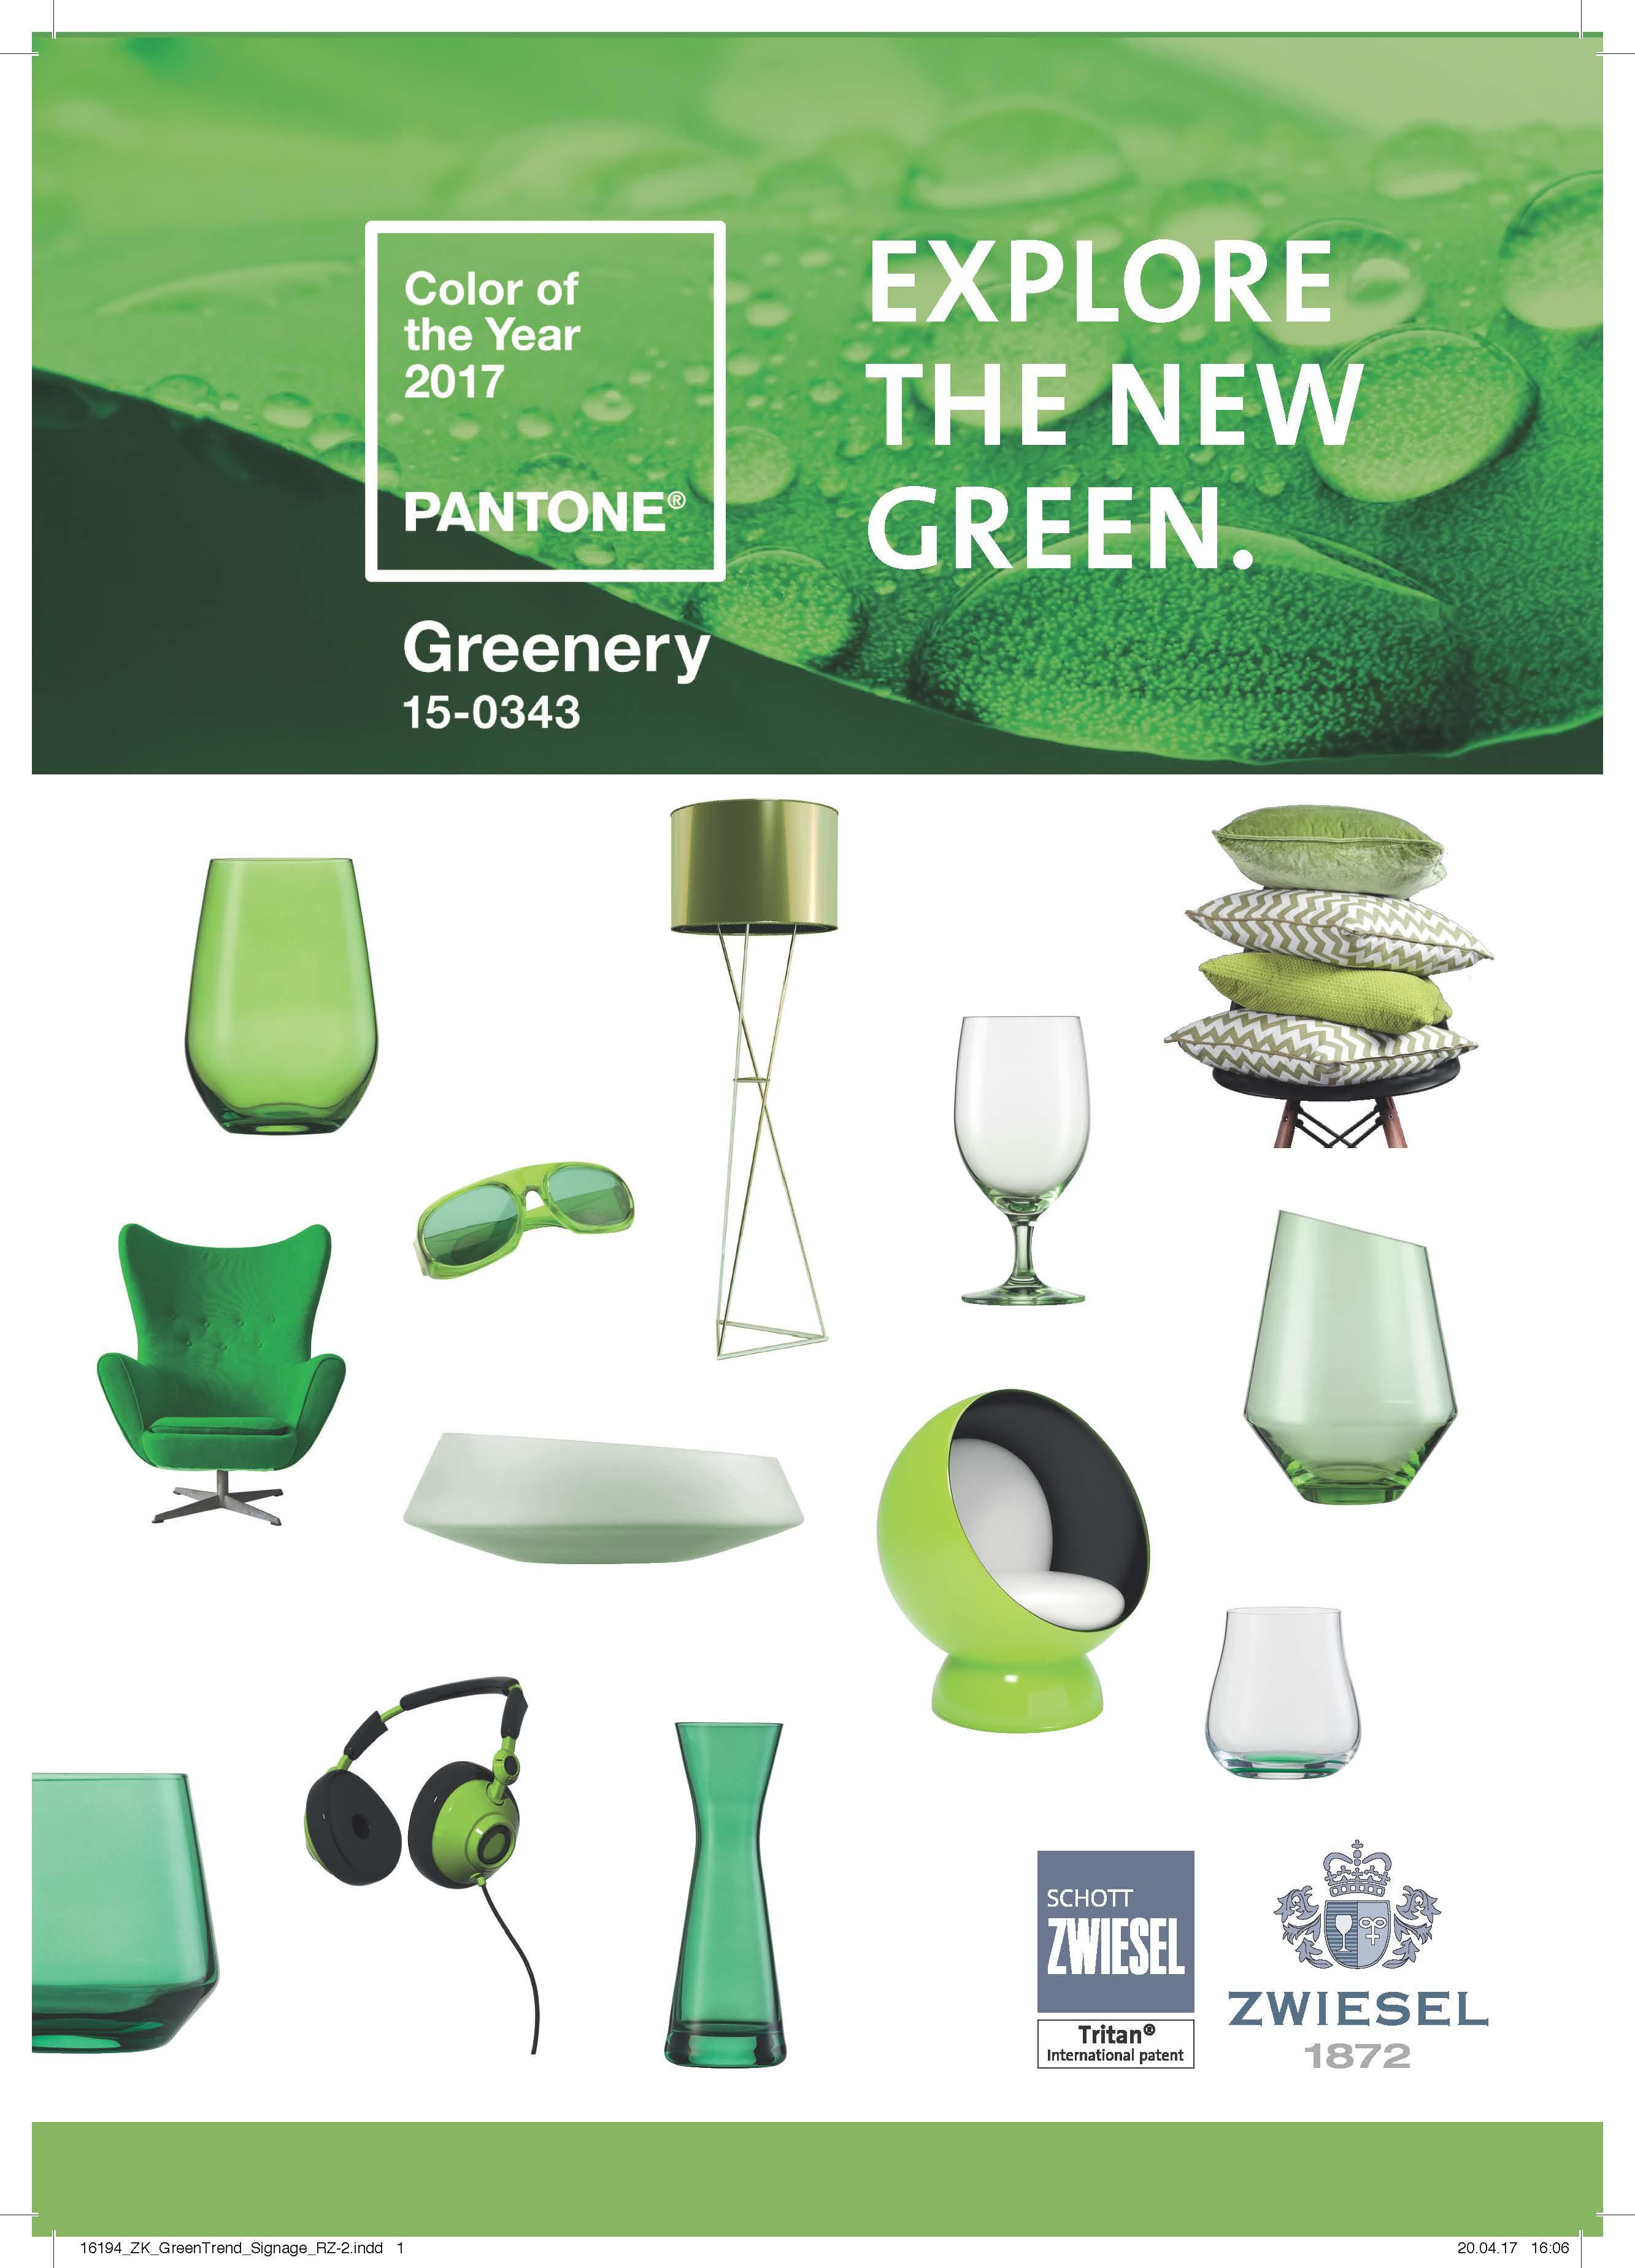 greentrend signage